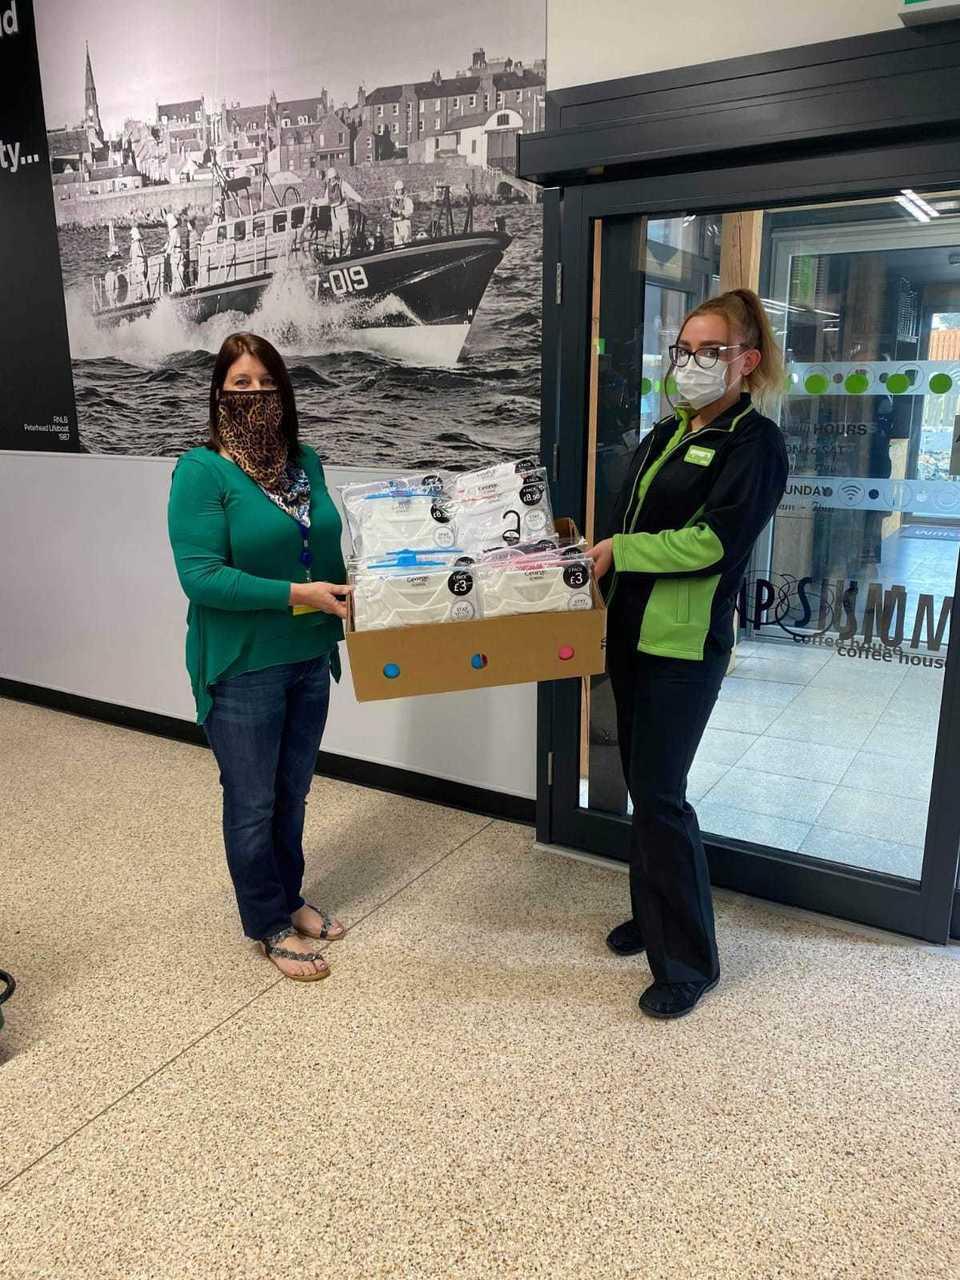 Donations to foodbank | Asda Peterhead